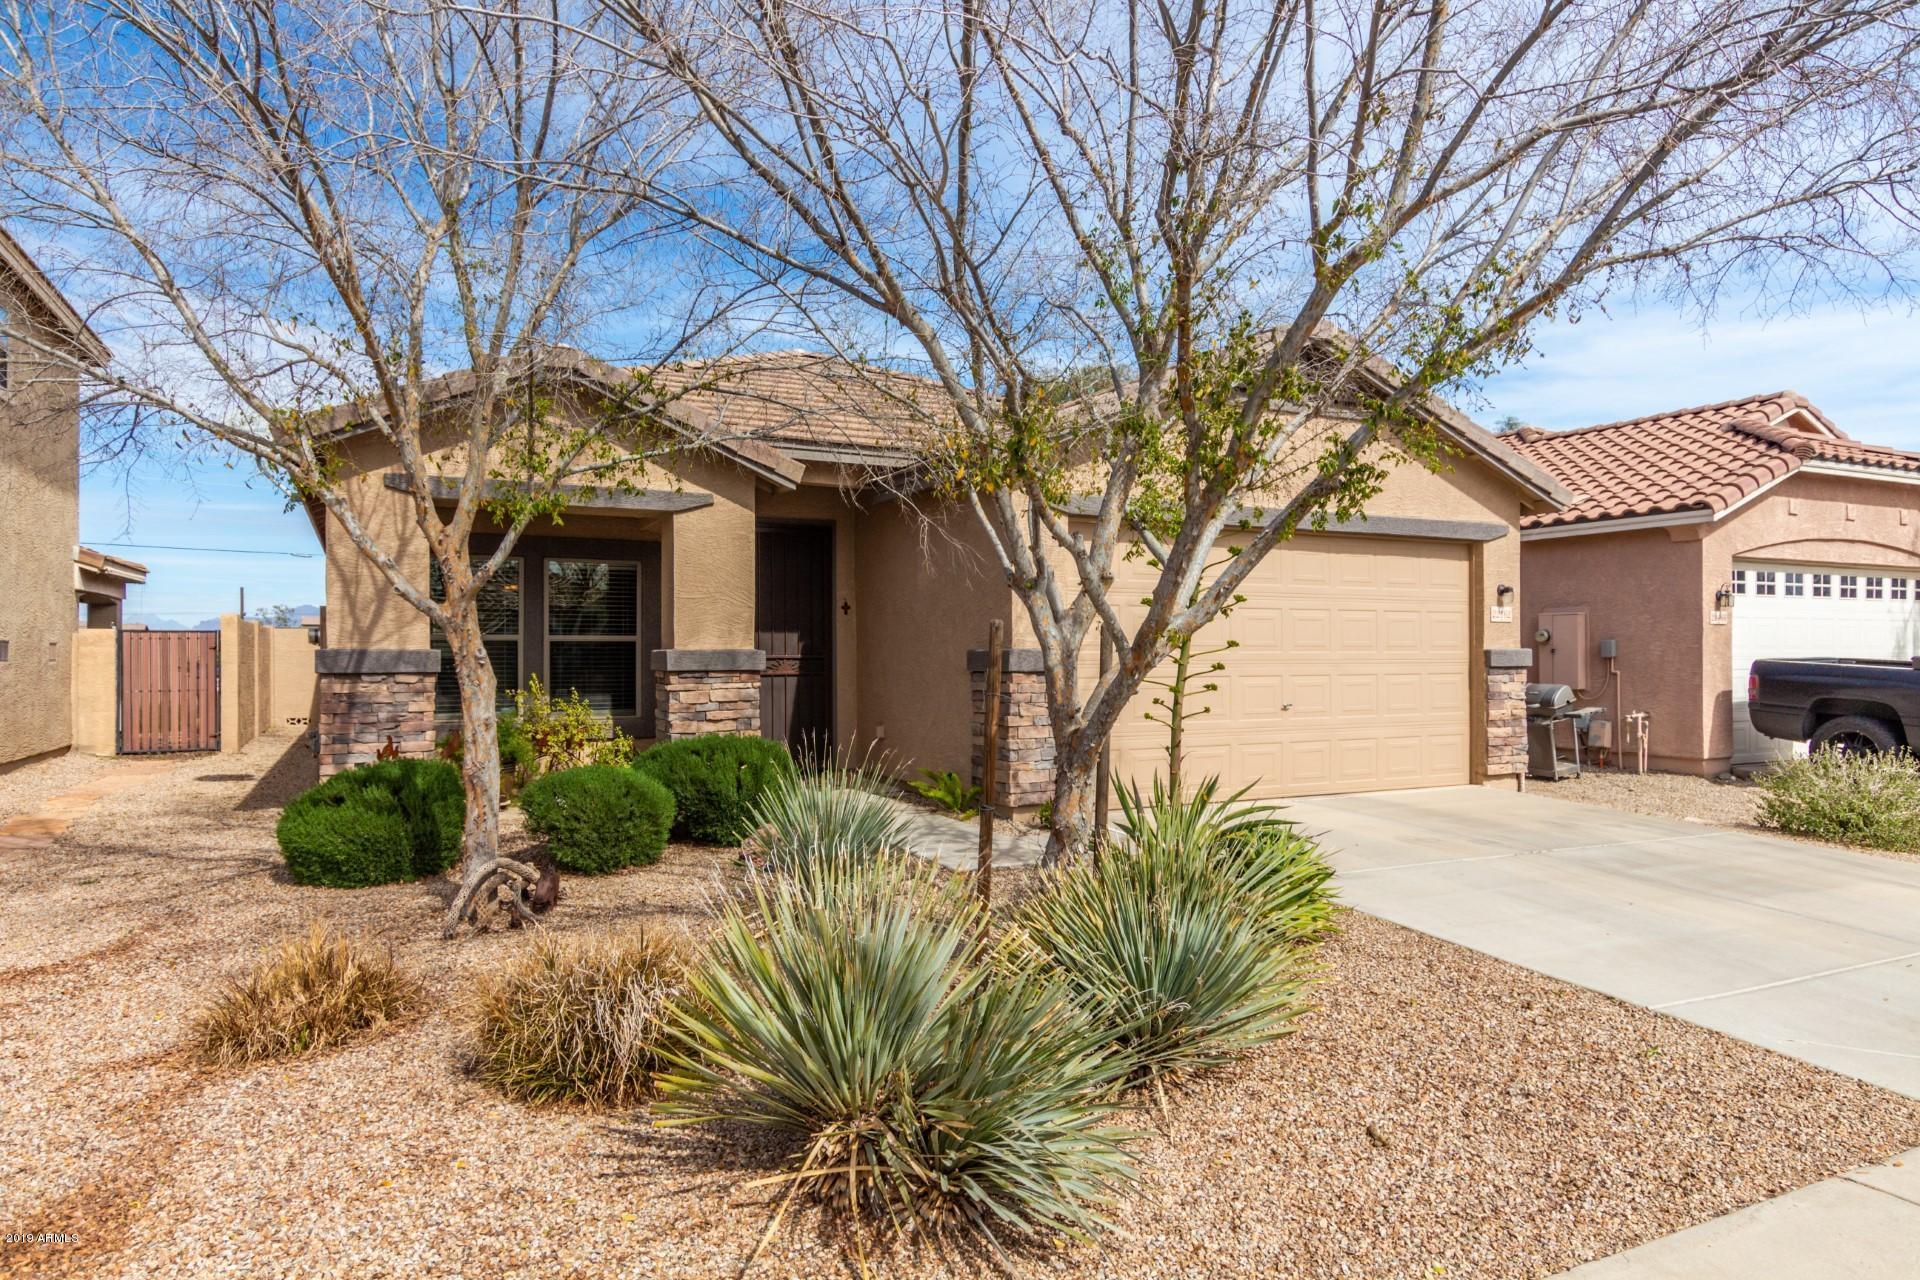 Photo of 22162 E VIA DEL PALO --, Queen Creek, AZ 85142